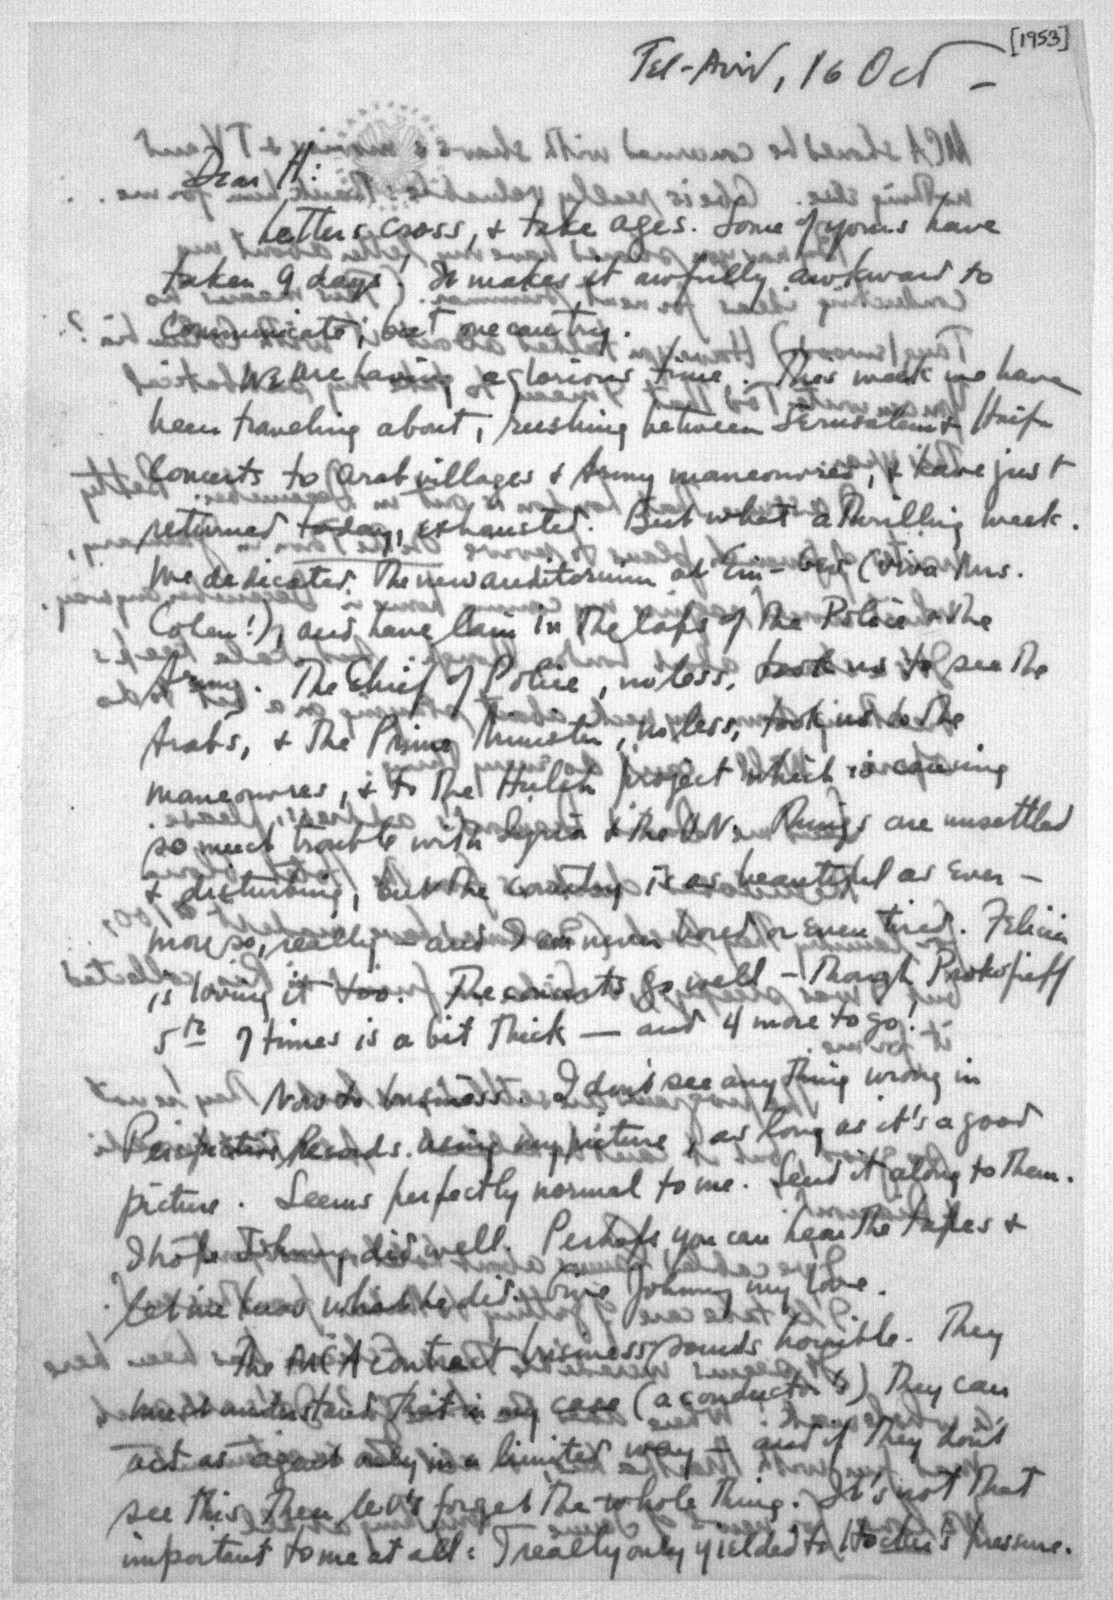 Letter from Leonard Bernstein to Helen Coates, October 16, 1953